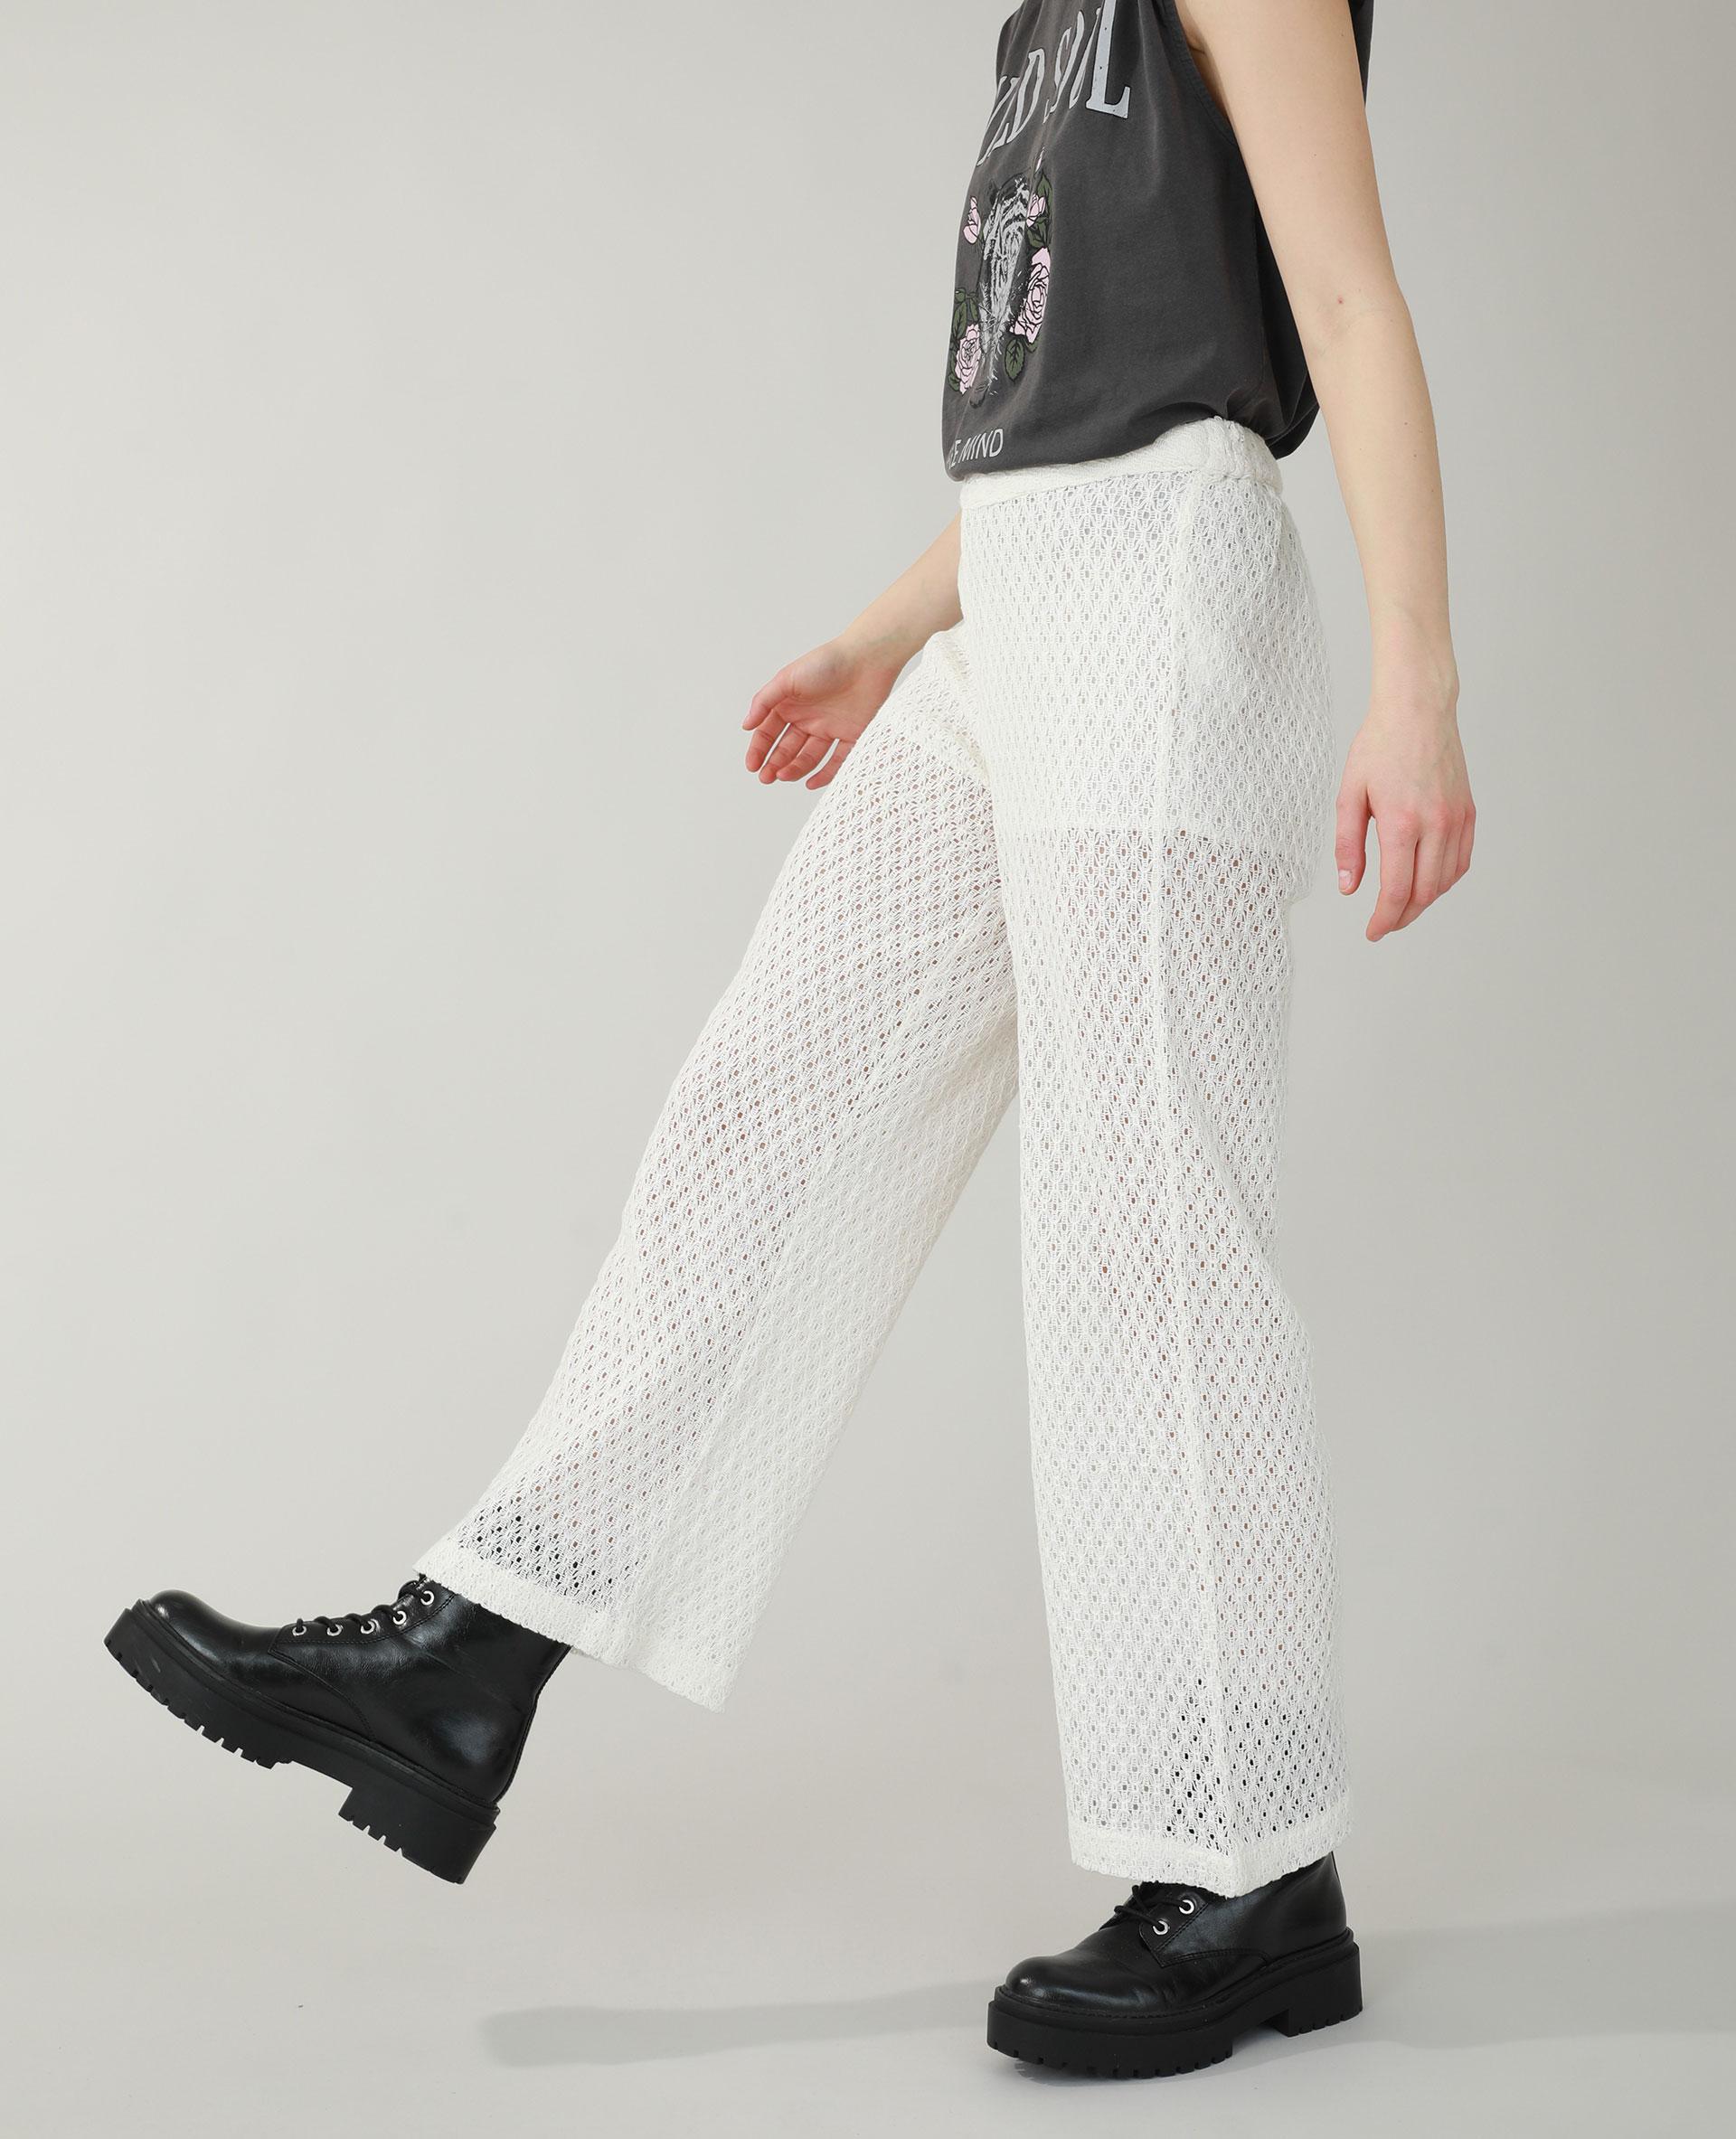 Pantalon en crochet blanc cassé - Pimkie